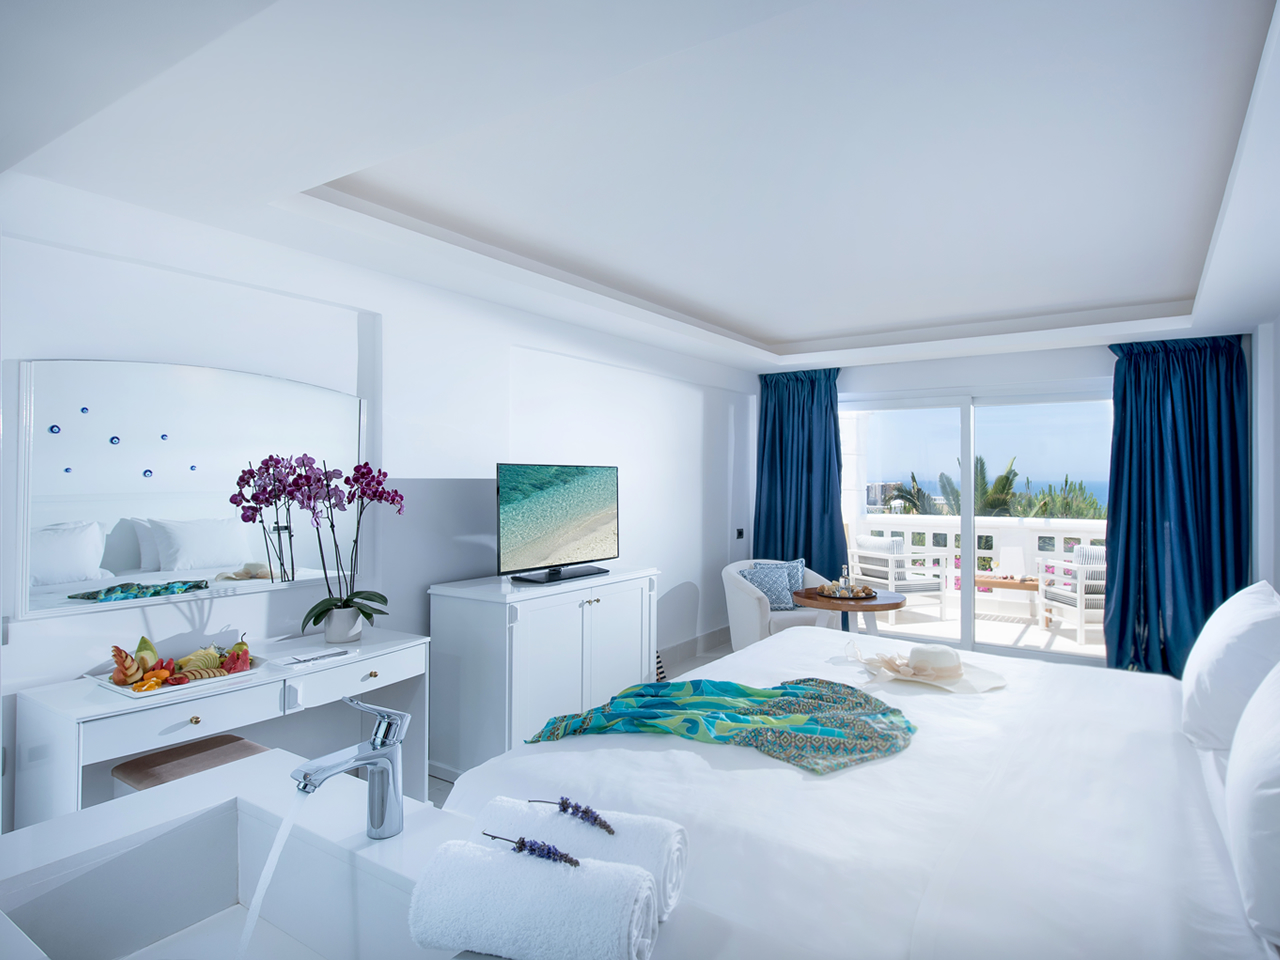 rooms-11_1280x960